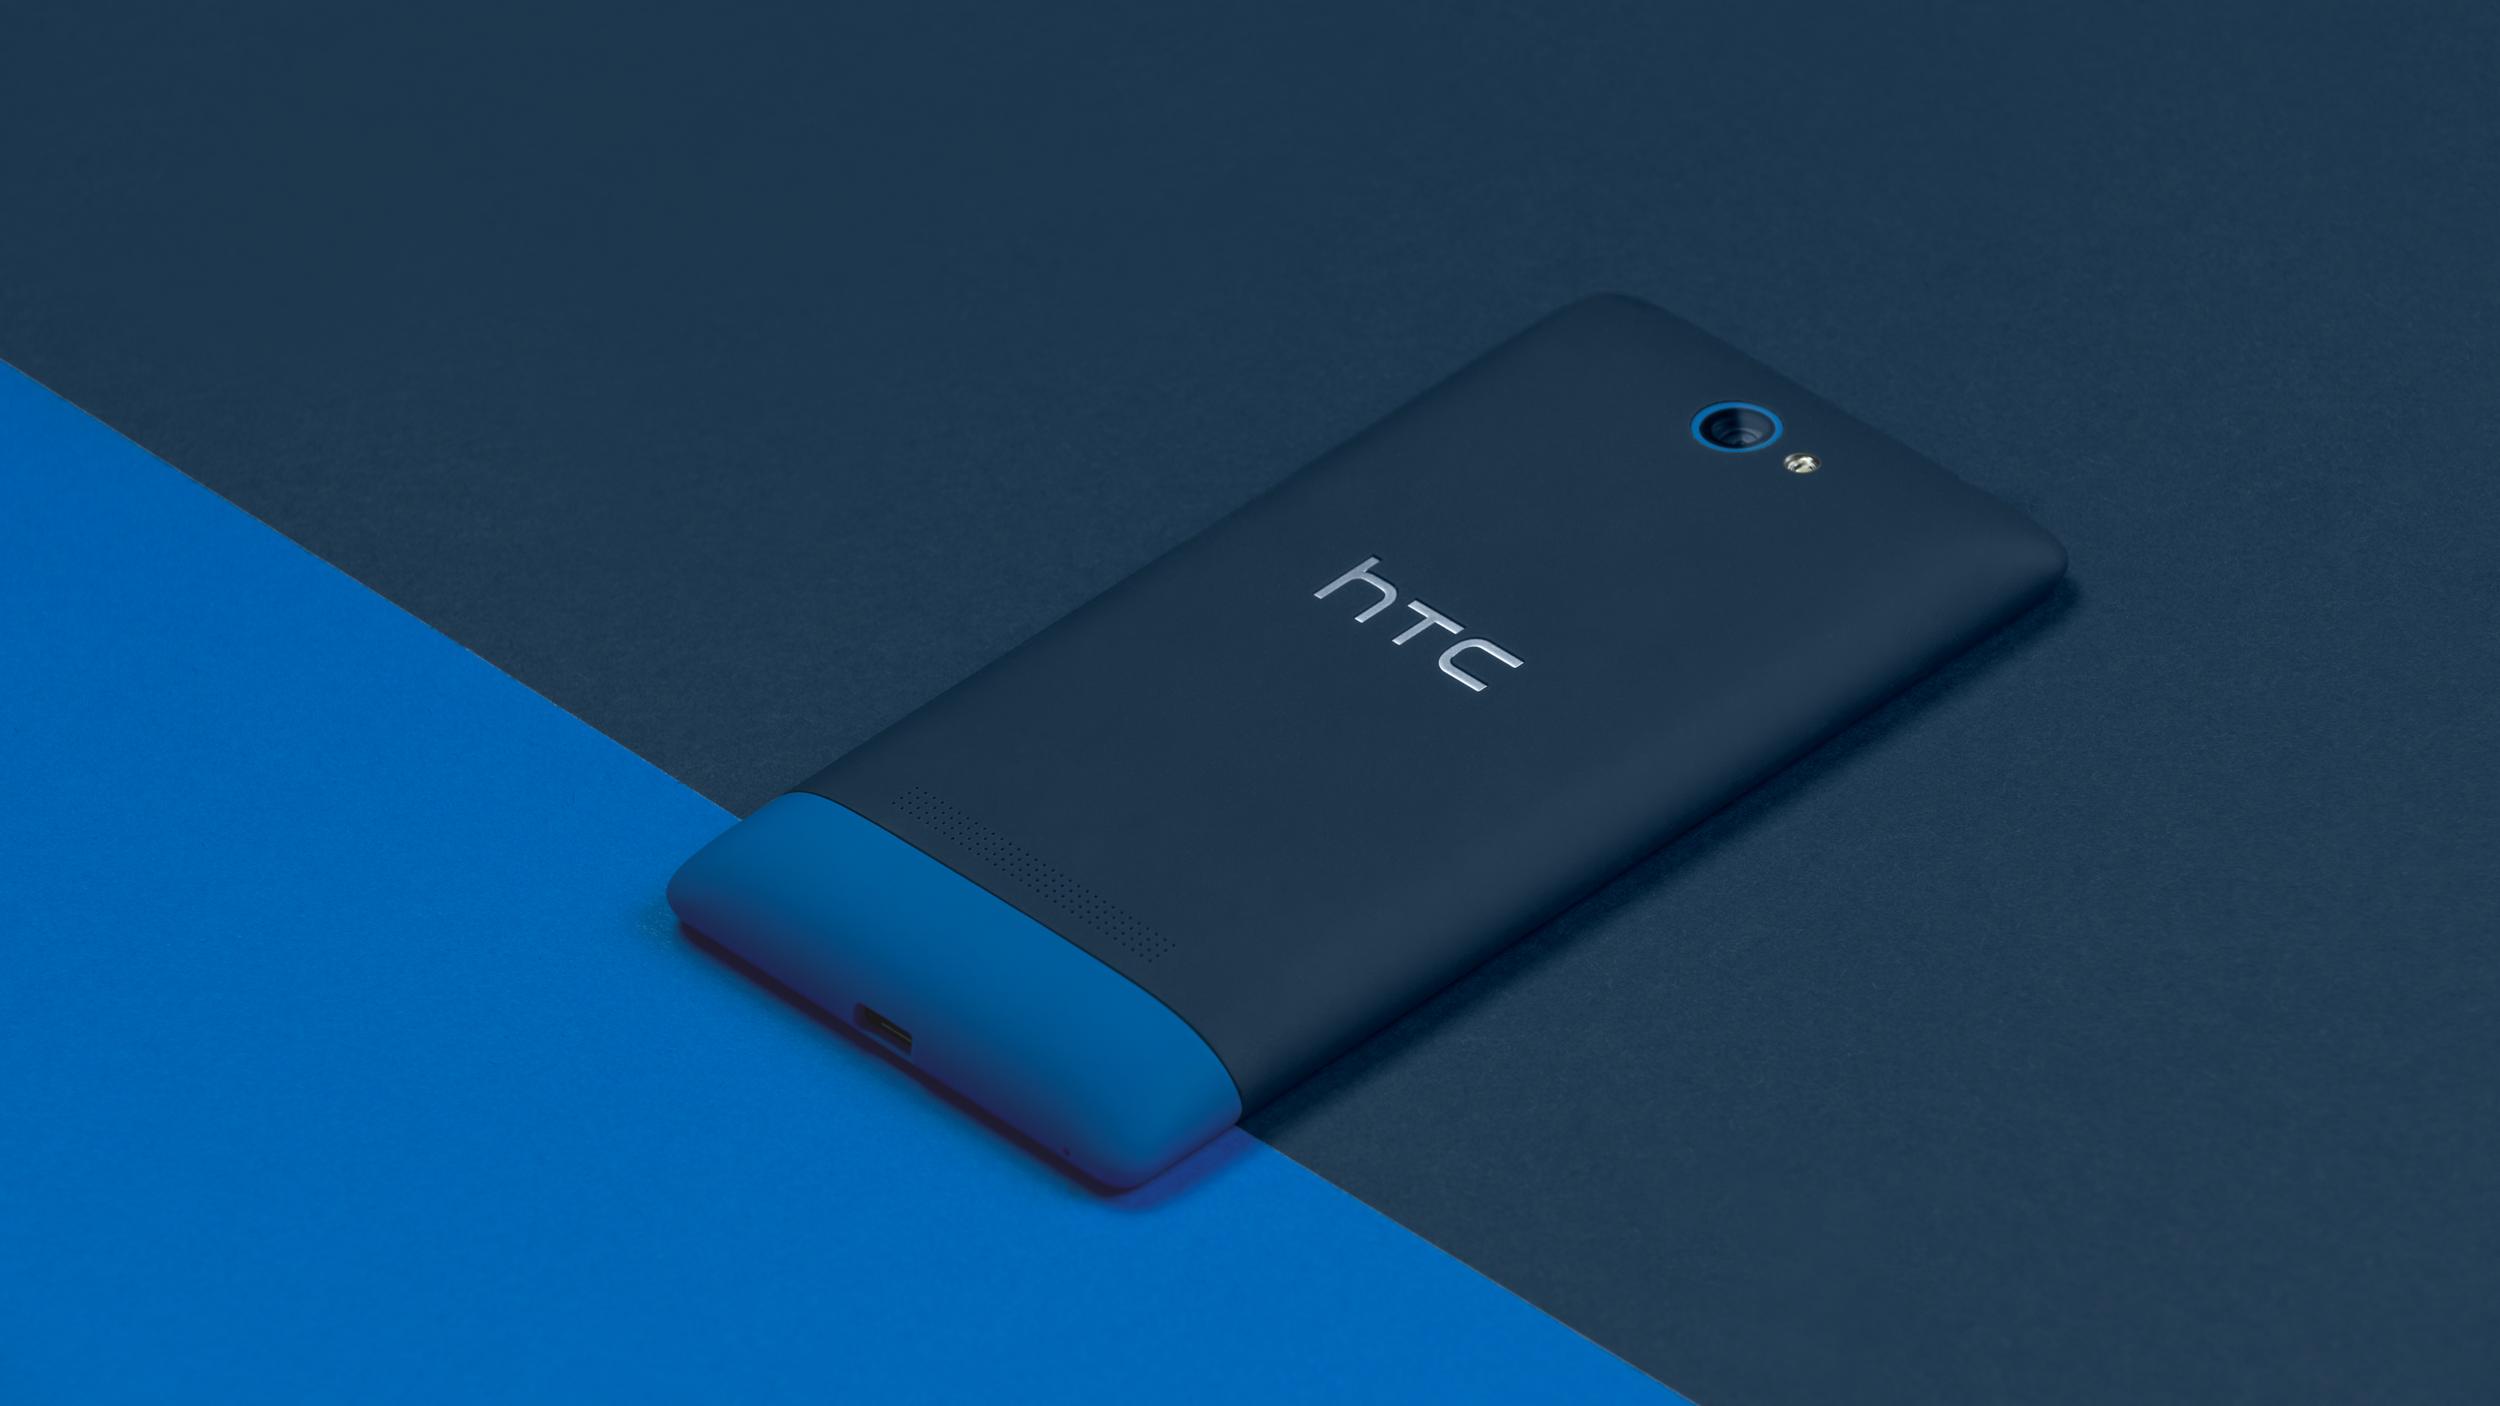 HTC_Windows_blue_paper-jl.png